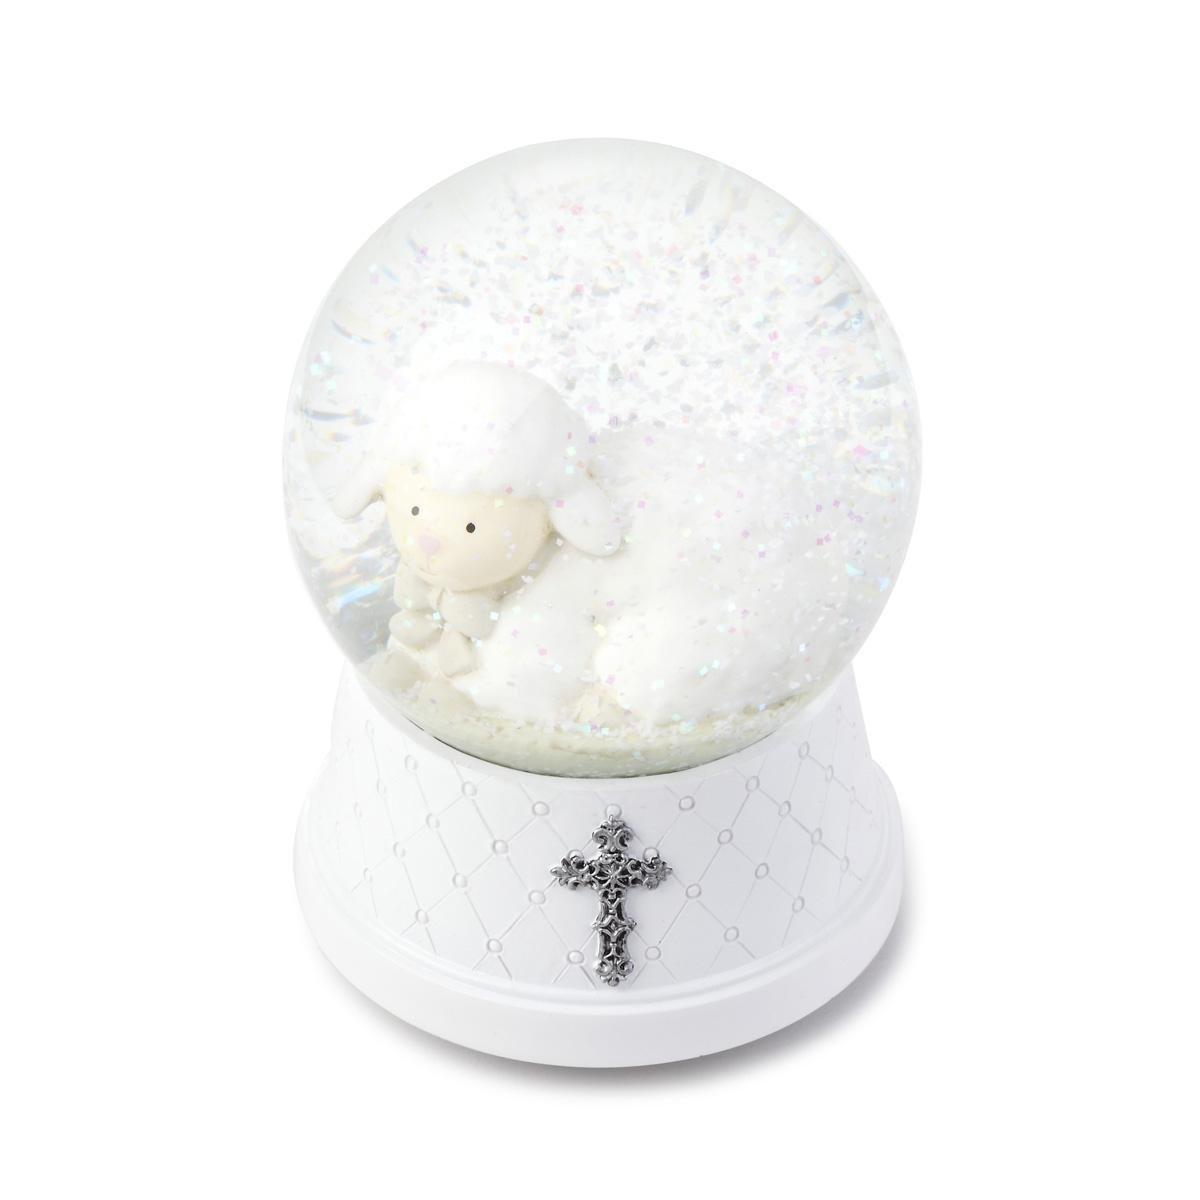 Image of Little Lamb Jesus Loves Me Water Globe